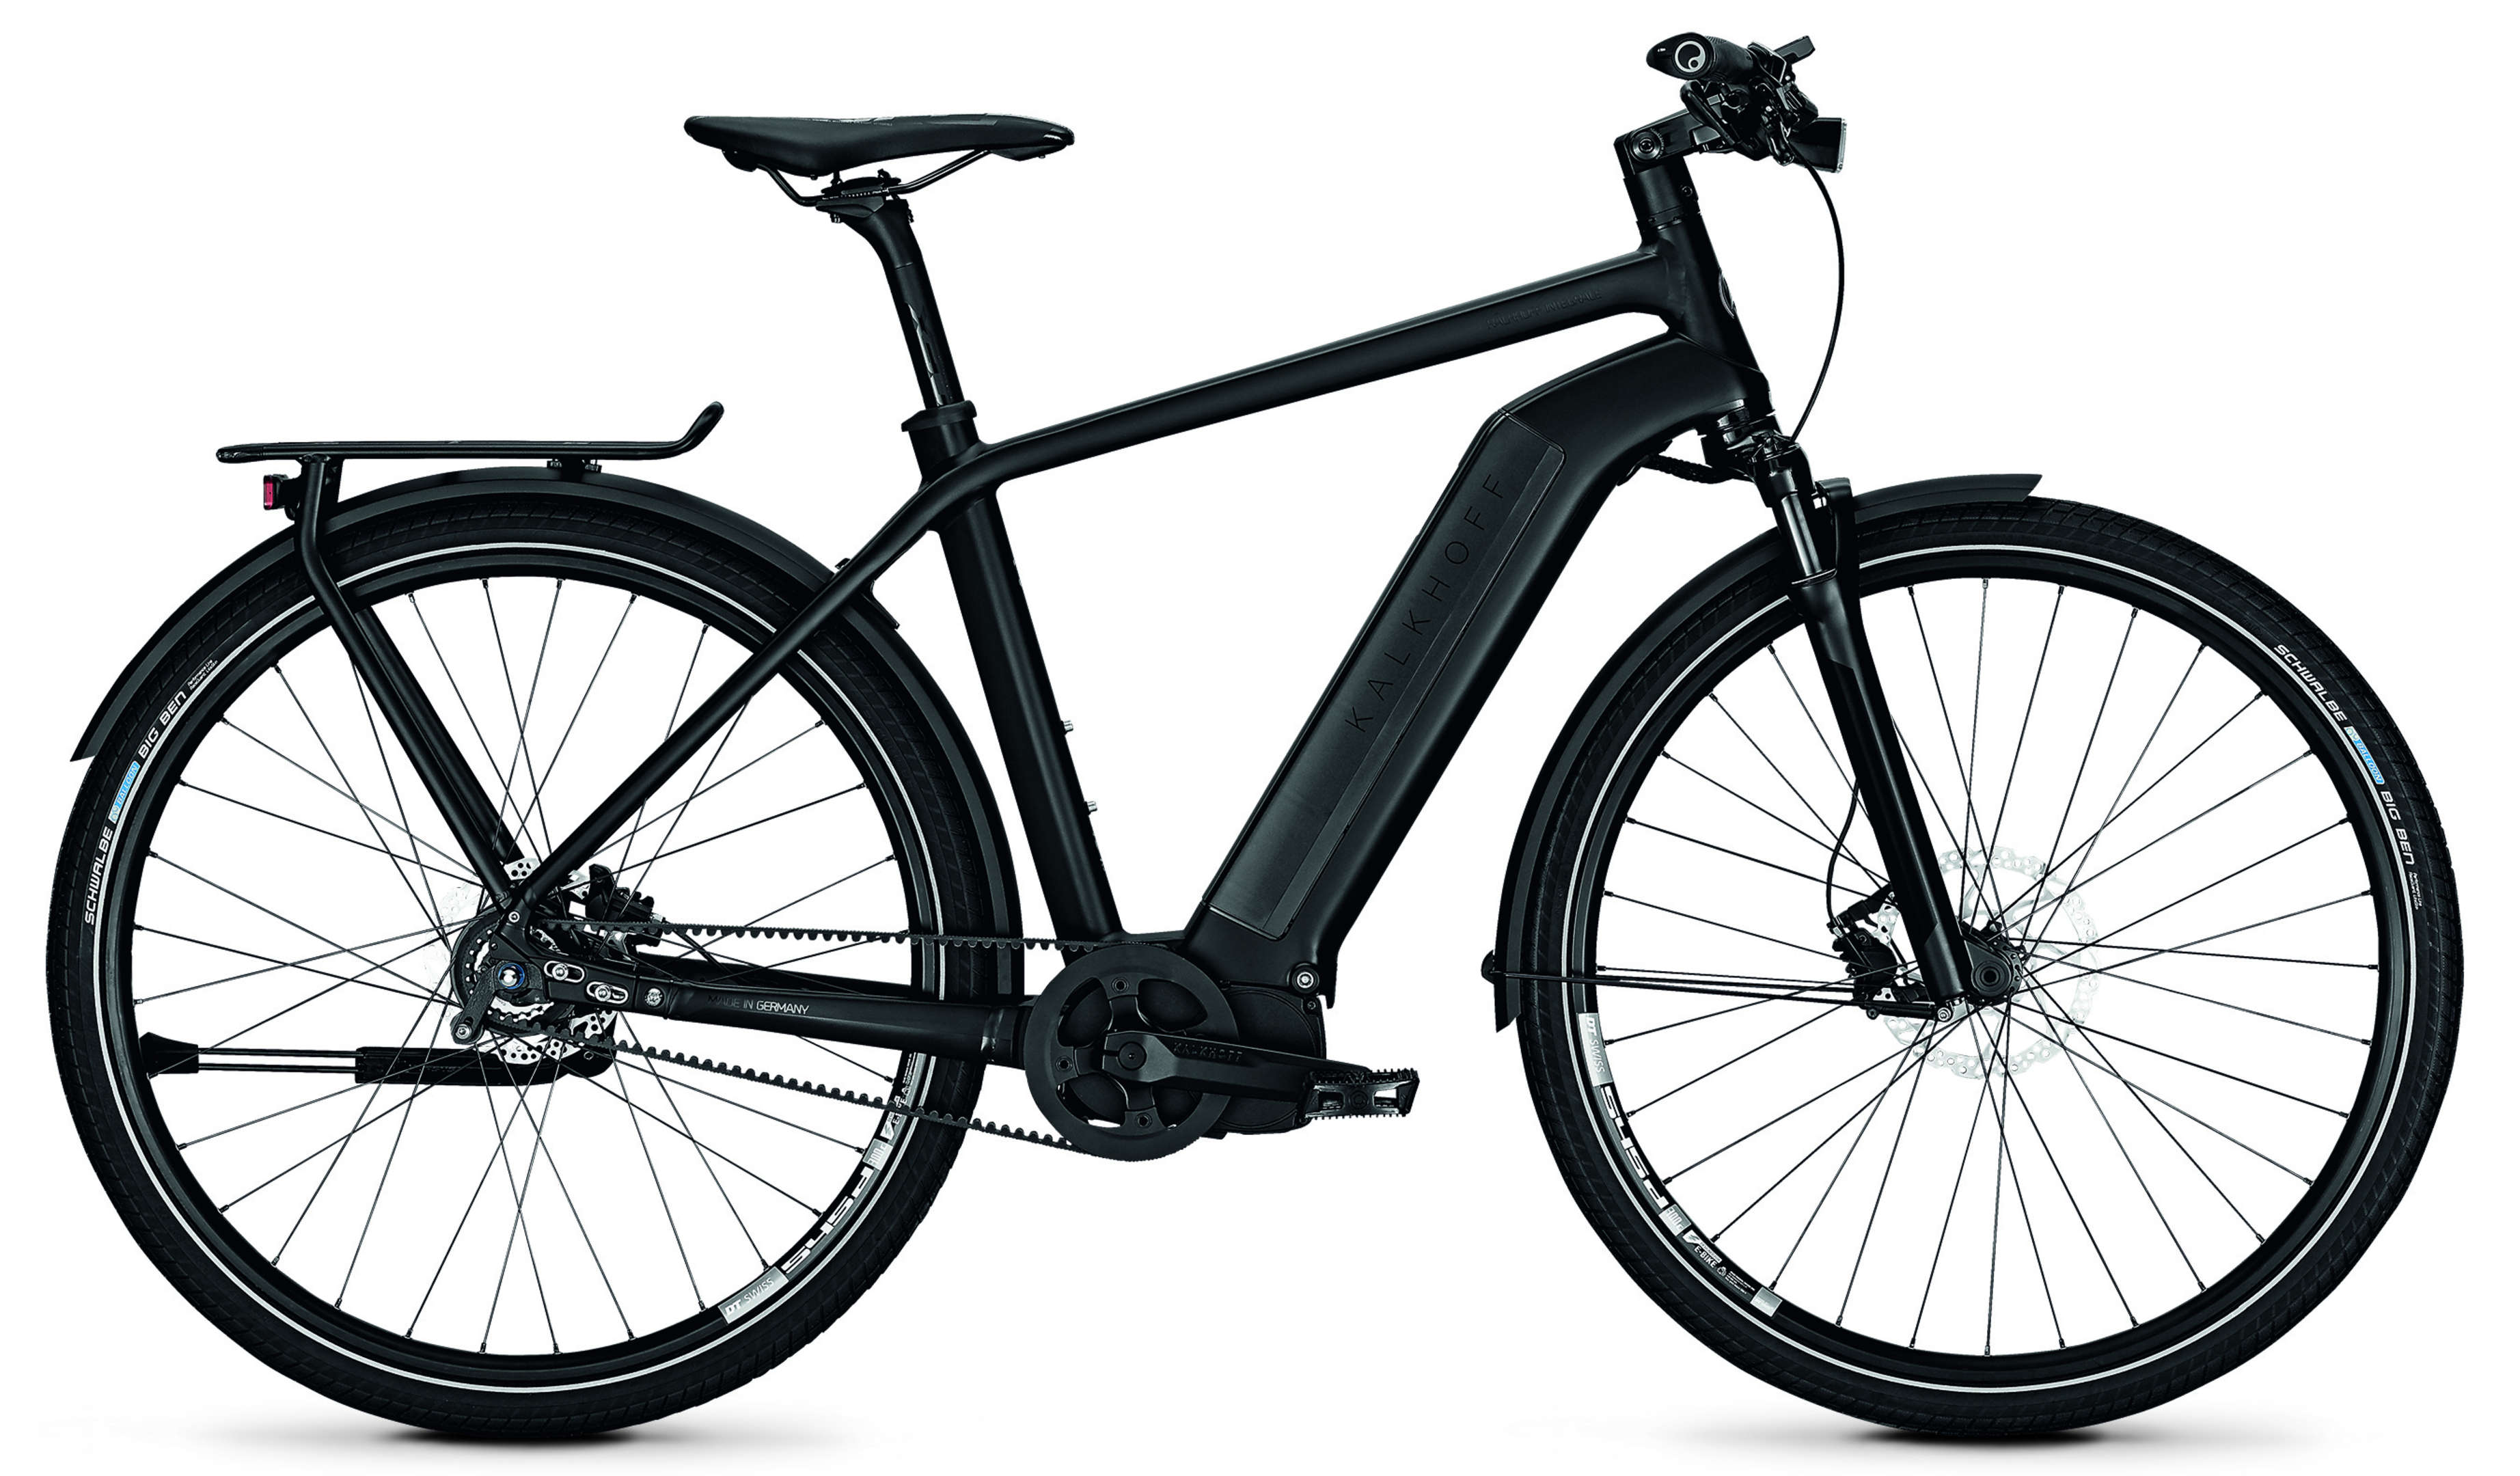 kalkhoff e trekking integrale i8 17 0ah 36v eurorad bikeleasingeurorad bikeleasing. Black Bedroom Furniture Sets. Home Design Ideas